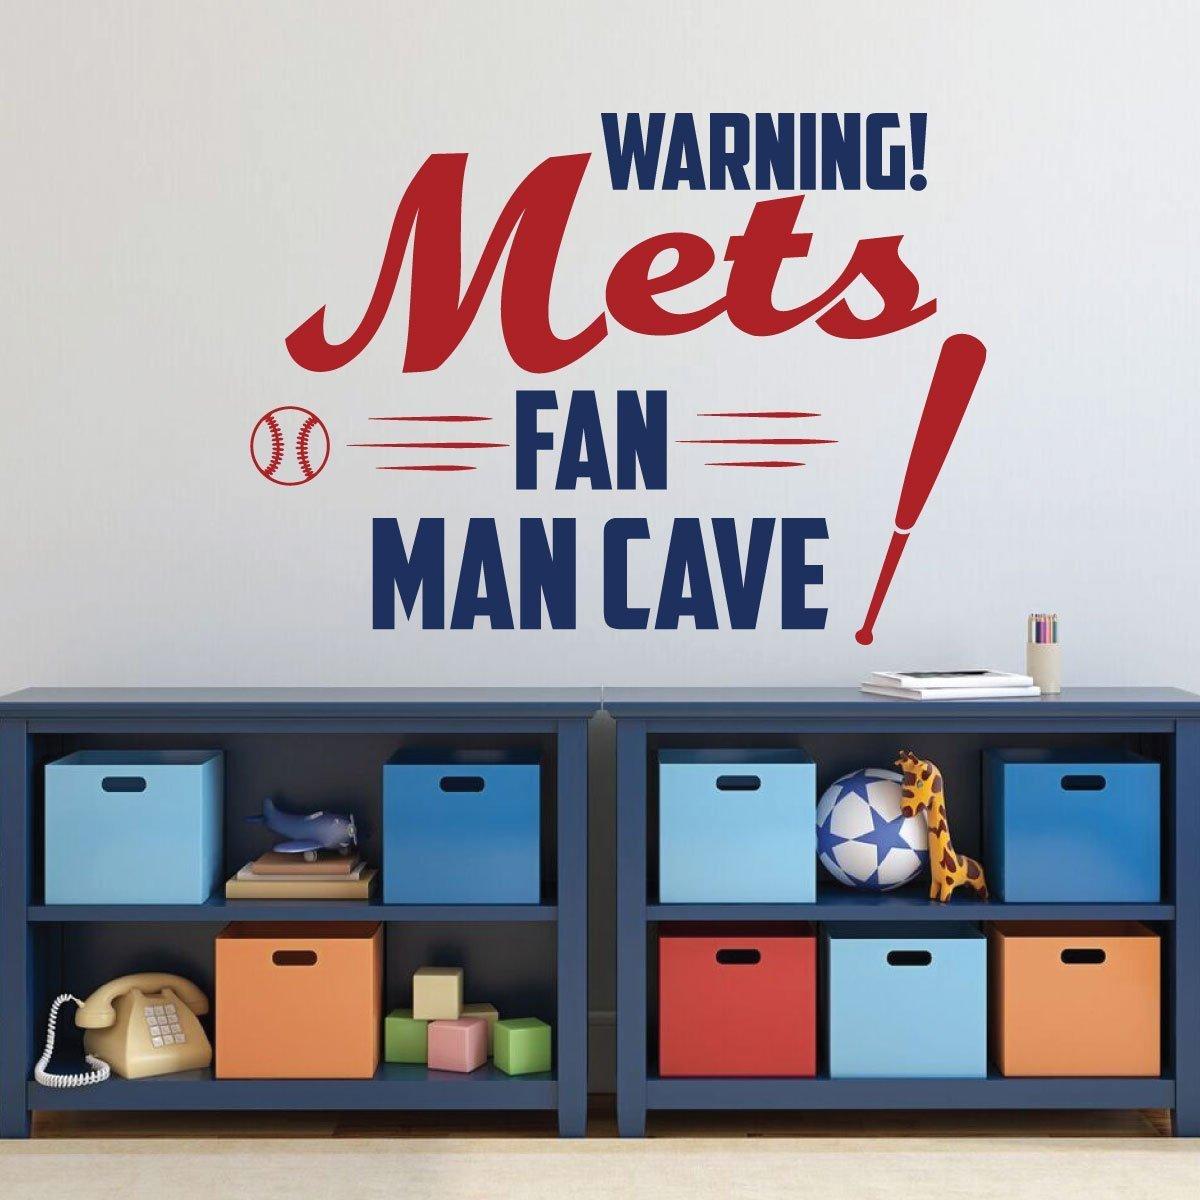 NY Mets Wall Art - Baseball Decorations - Sports Team Athlete Bedroom Decor - Vinyl Wall Decal - MLB Wall Decals for Bedroom, Dorm, Playroom - ManCave Wall Decor